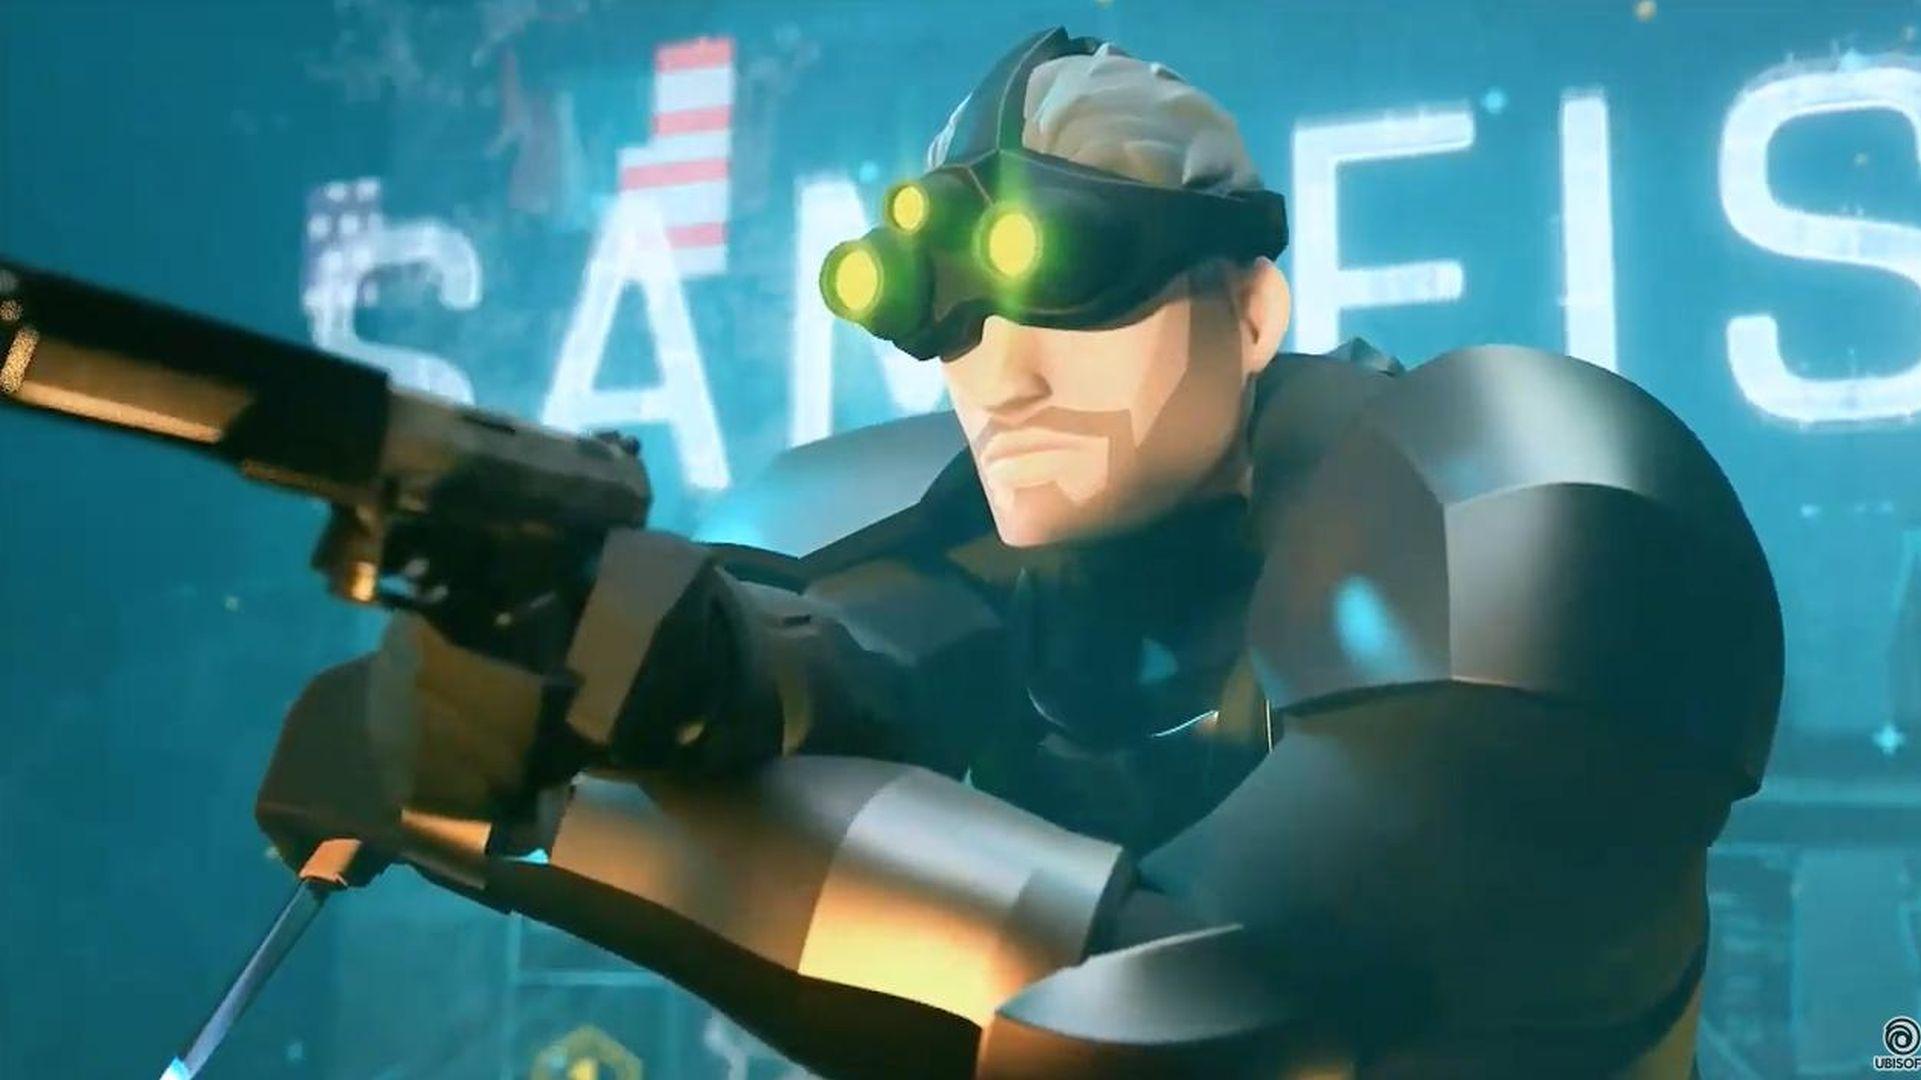 Tom Clancy's Elite Squad E3 Ubisoft 2019 Splinter Cell Sam Fisher